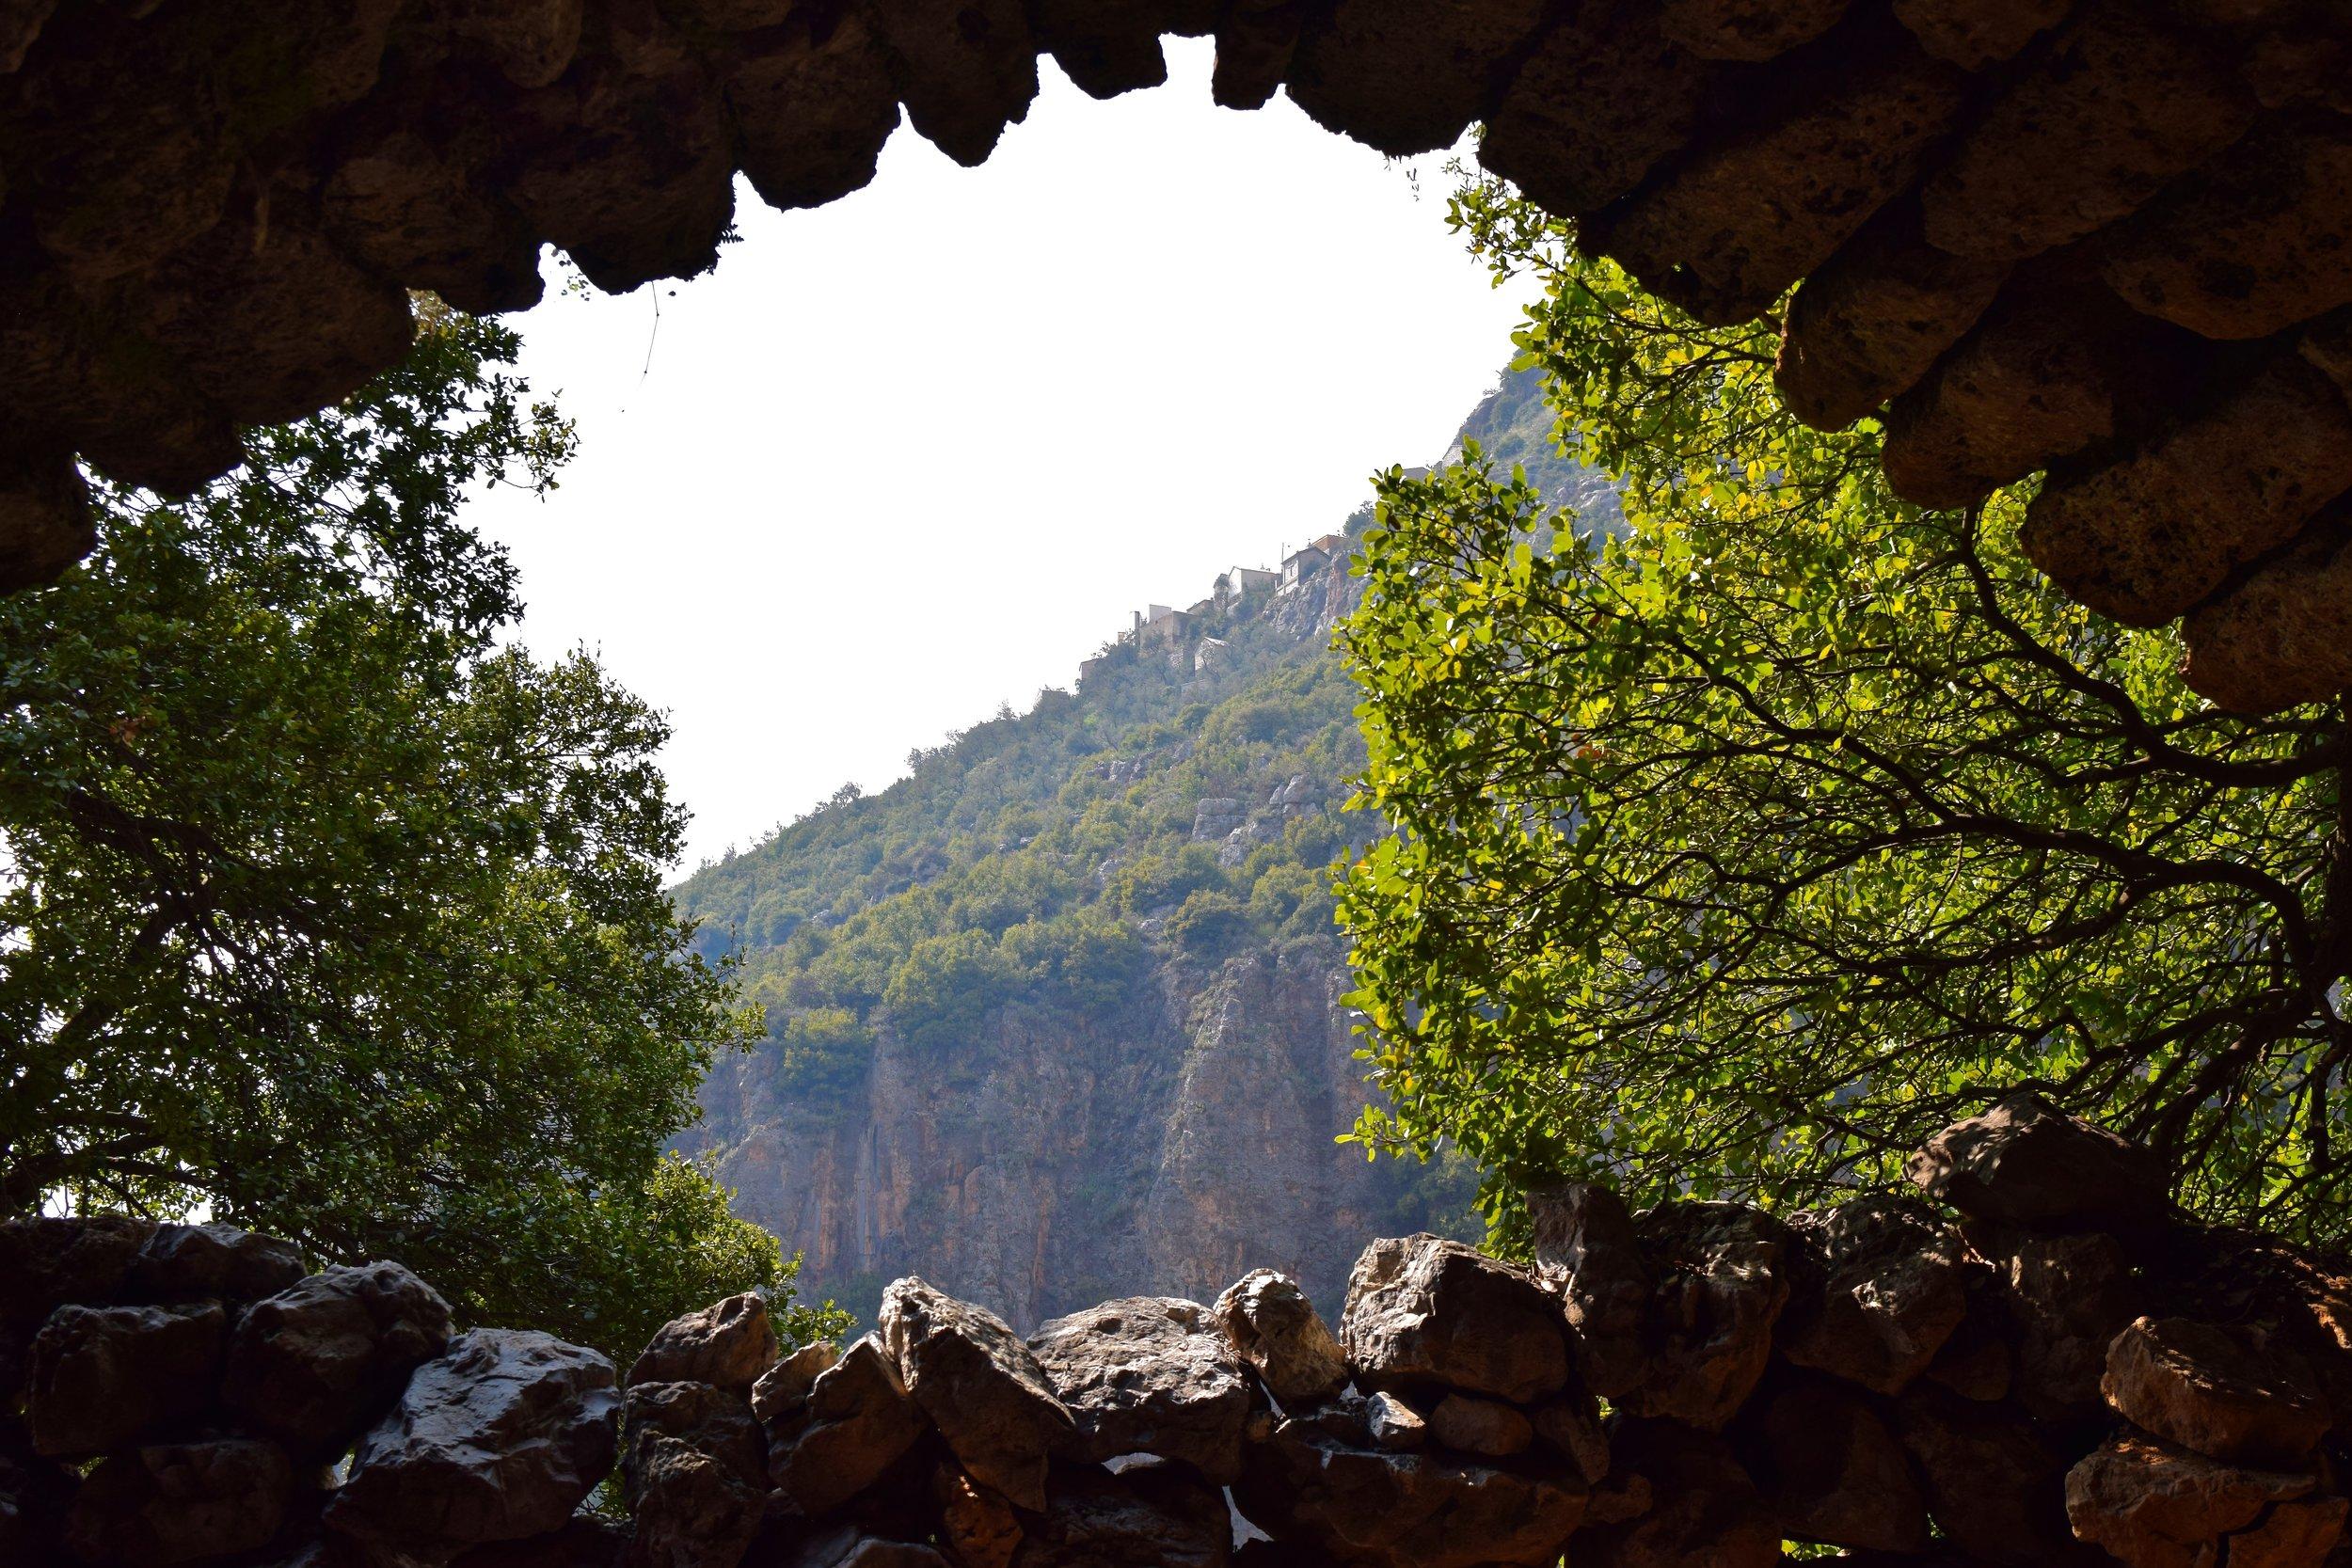 Views of Qadisha Valley from Mar Sarkis Church